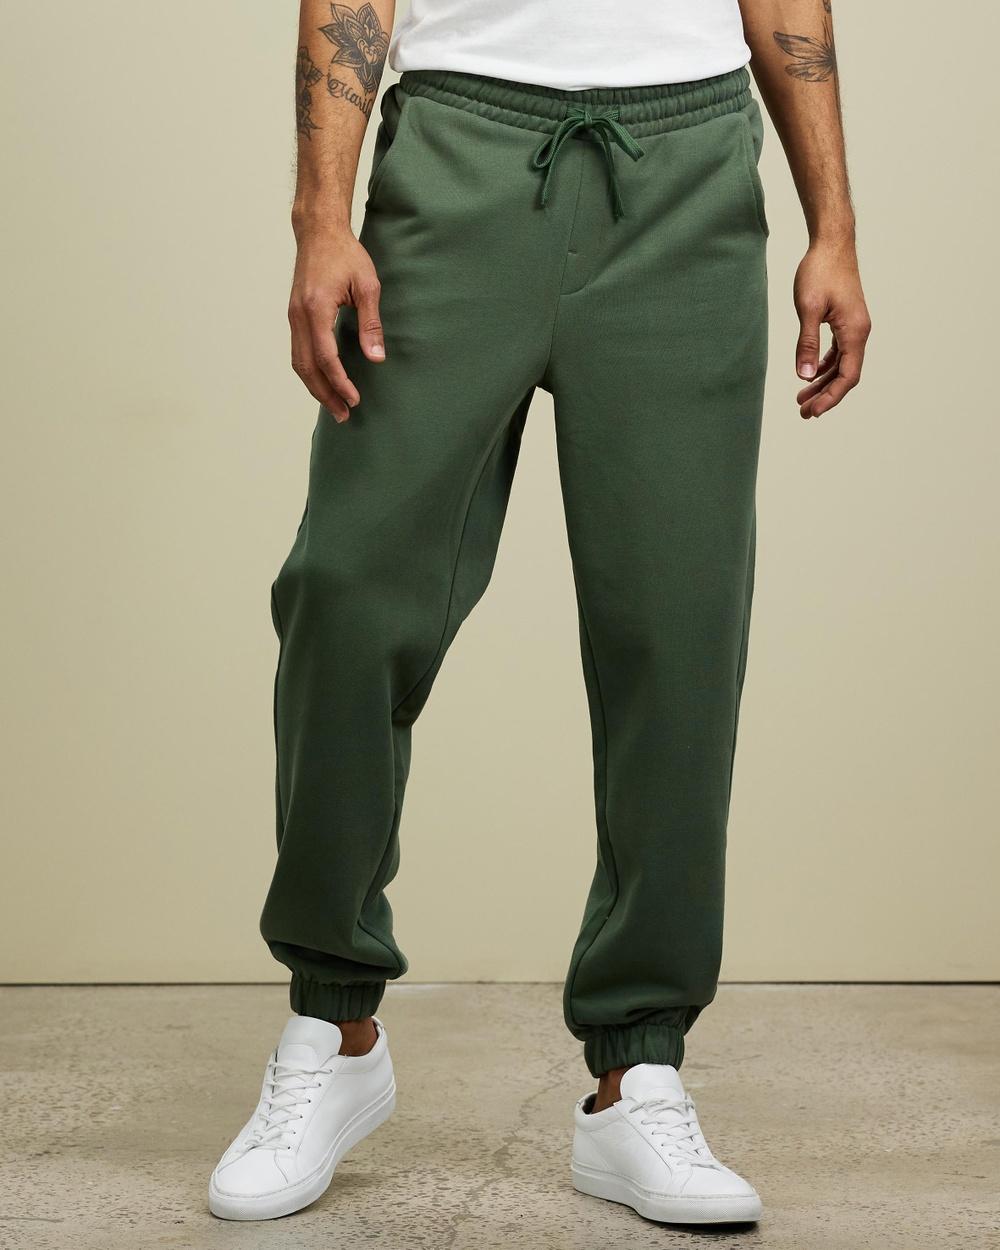 AERE Organic Cotton Track Pants Sweatpants Khaki